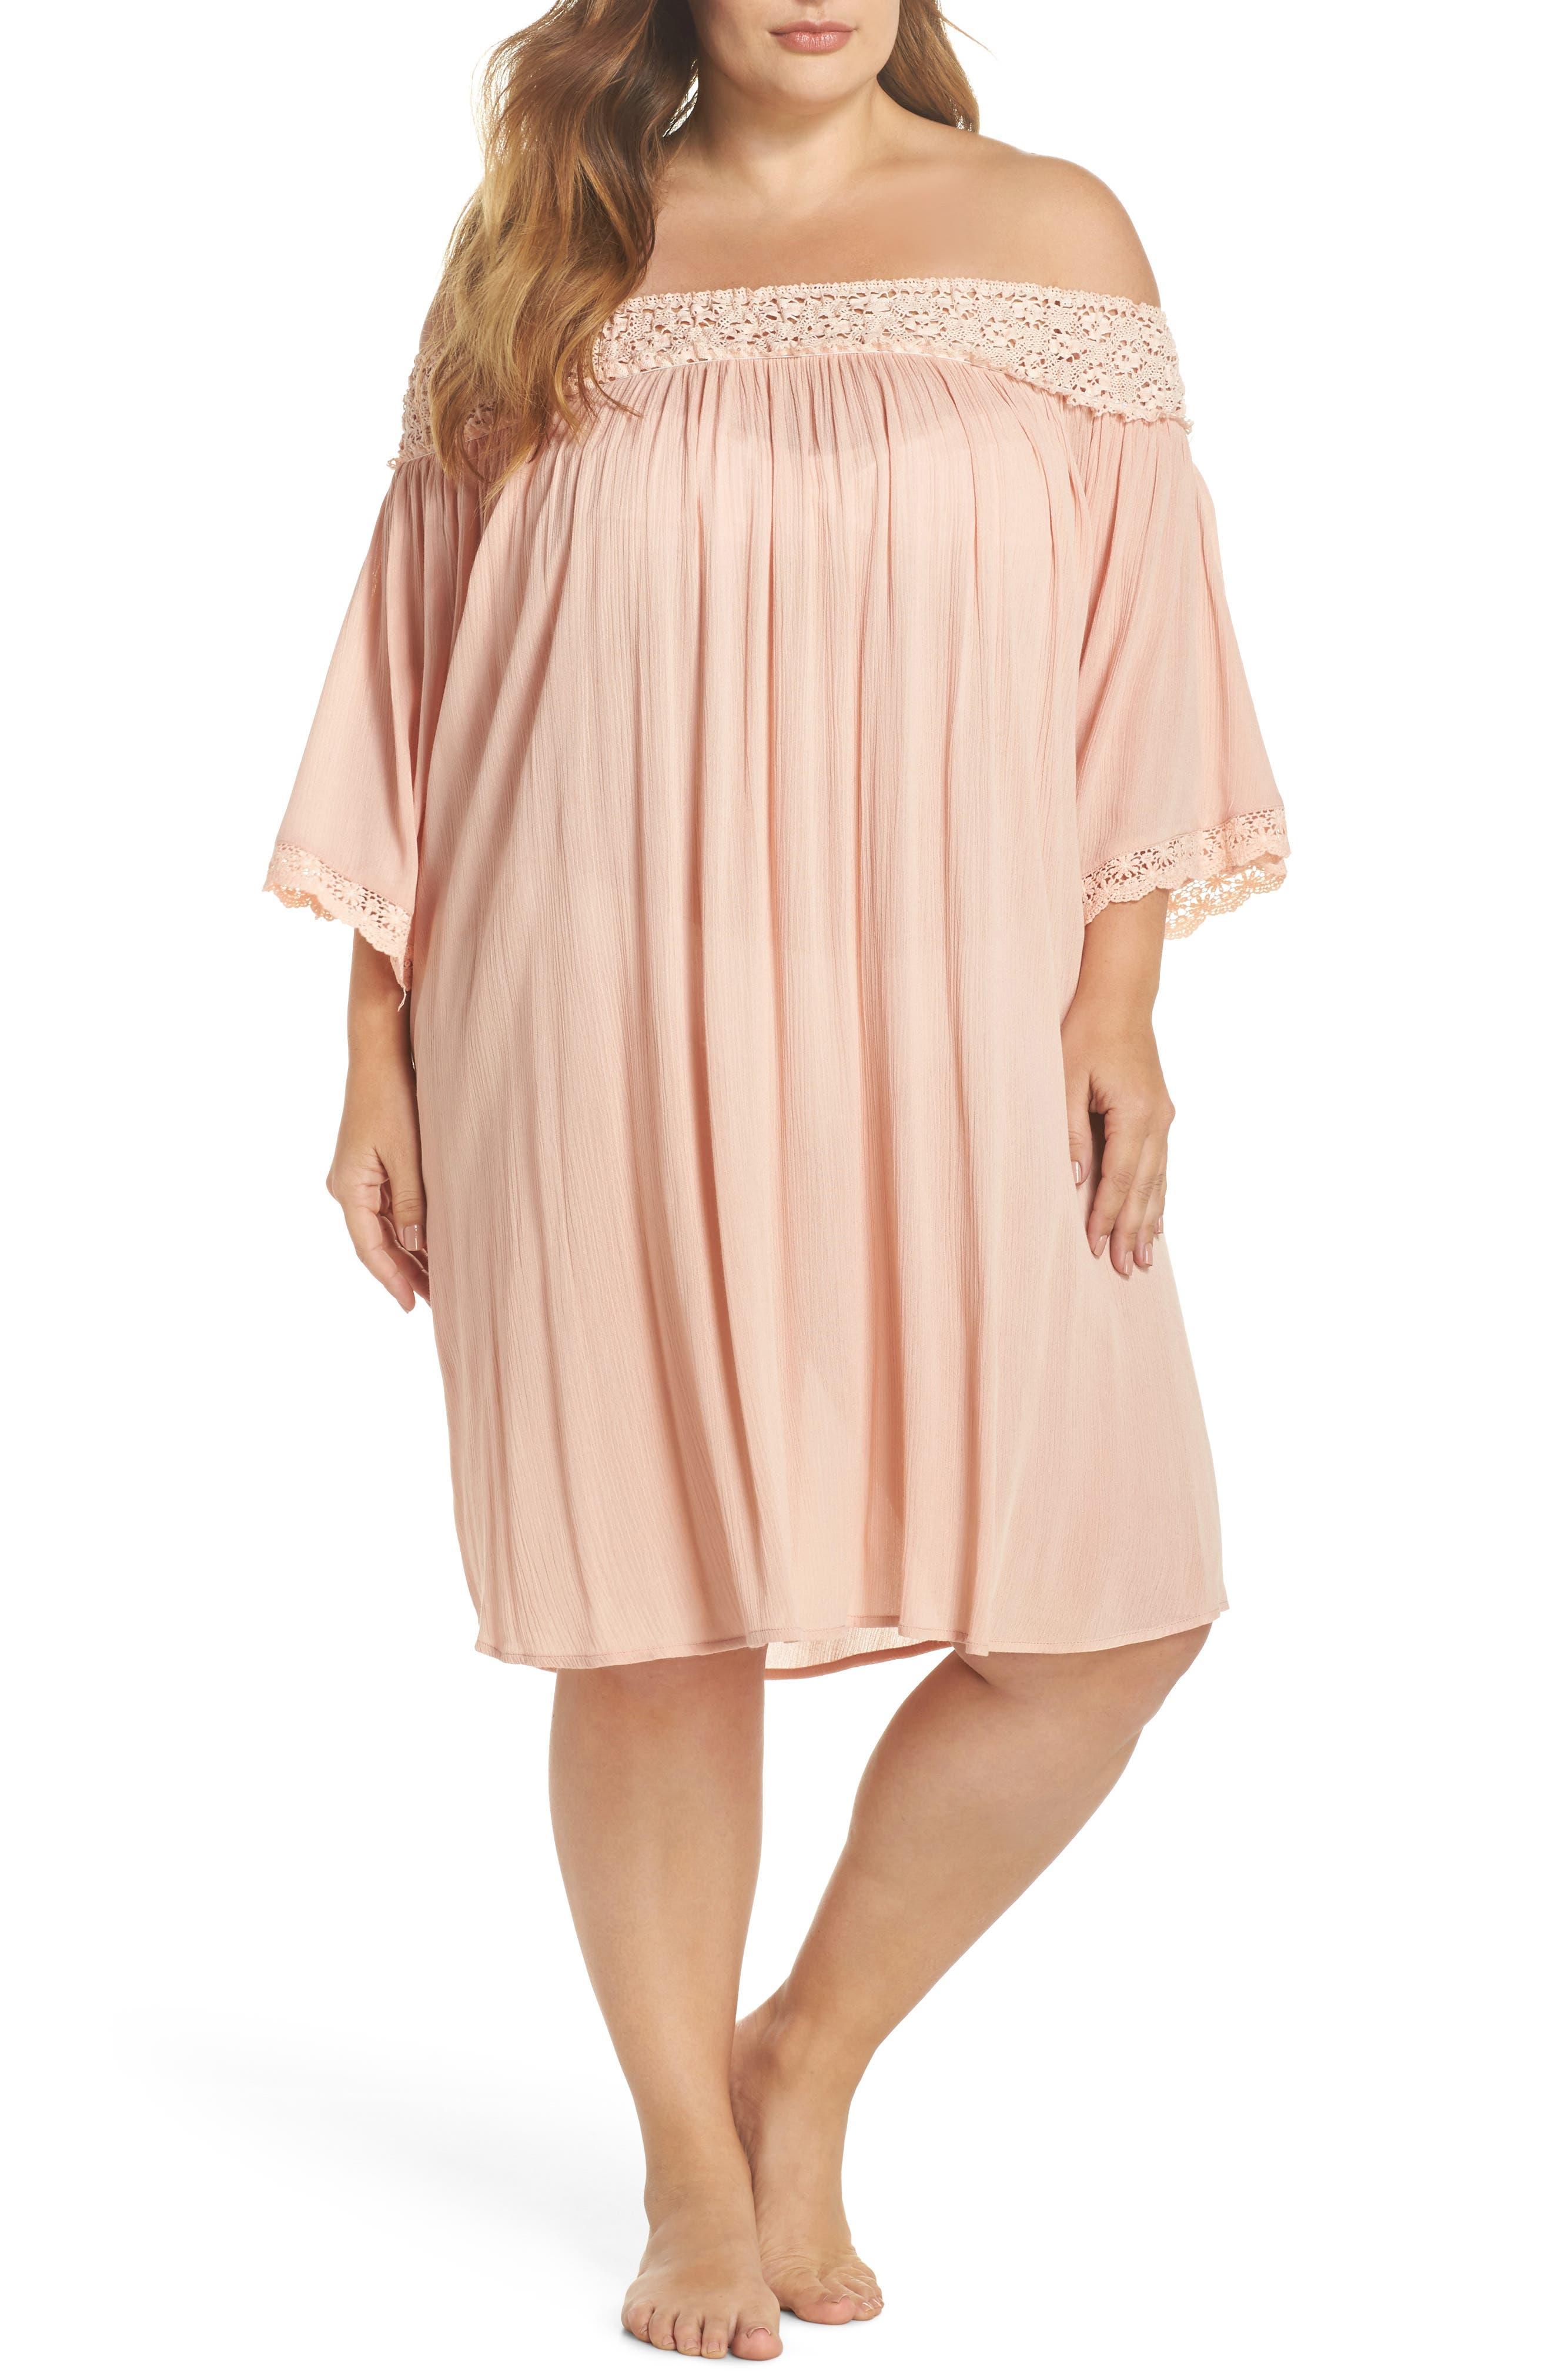 Rimini Crochet Cover-Up Dress,                             Main thumbnail 1, color,                             Pink